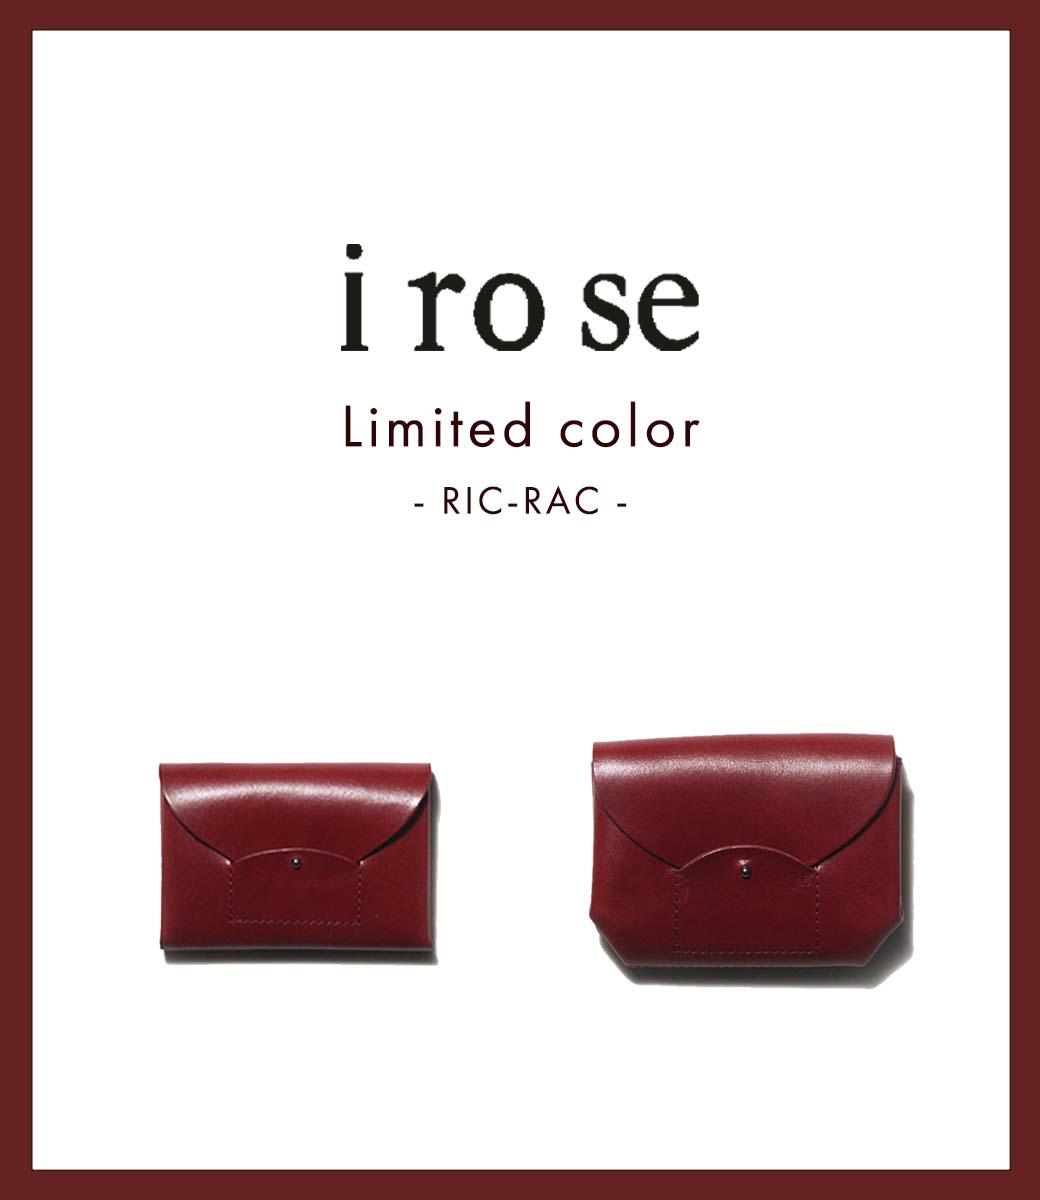 irose new color